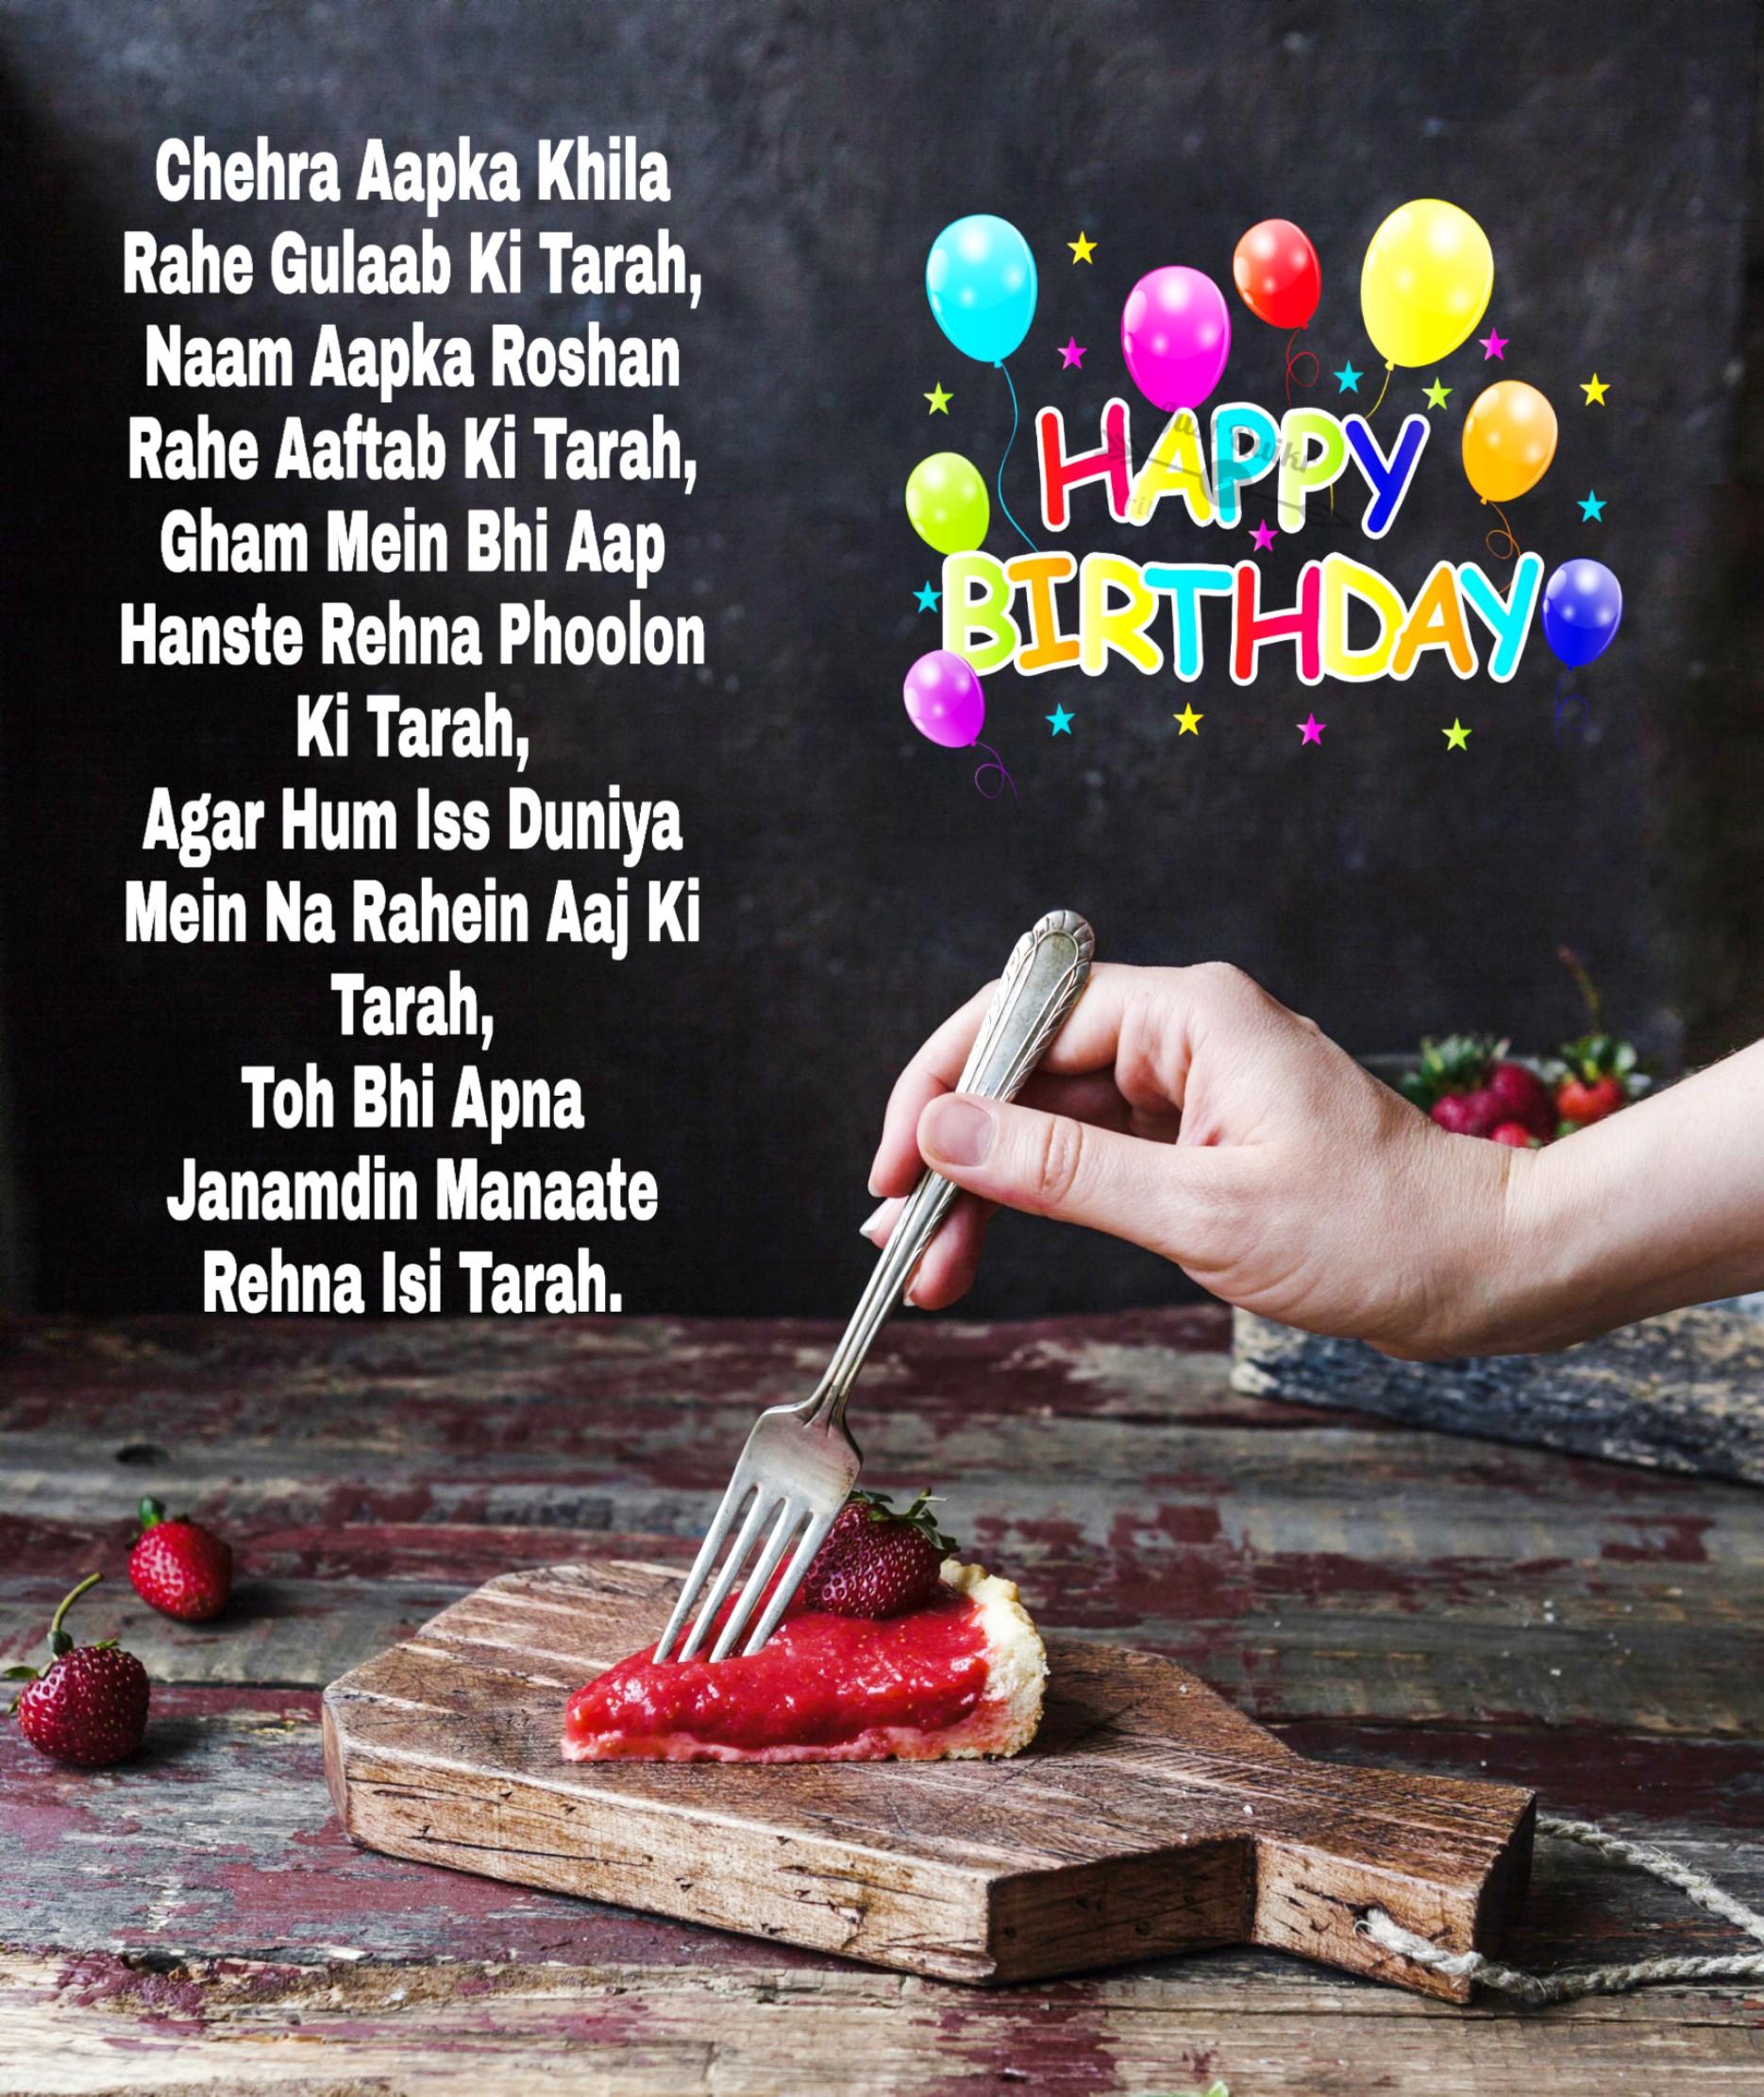 Happy Birthday Cake HD Pics Images with Shayari Sayings for Chachu